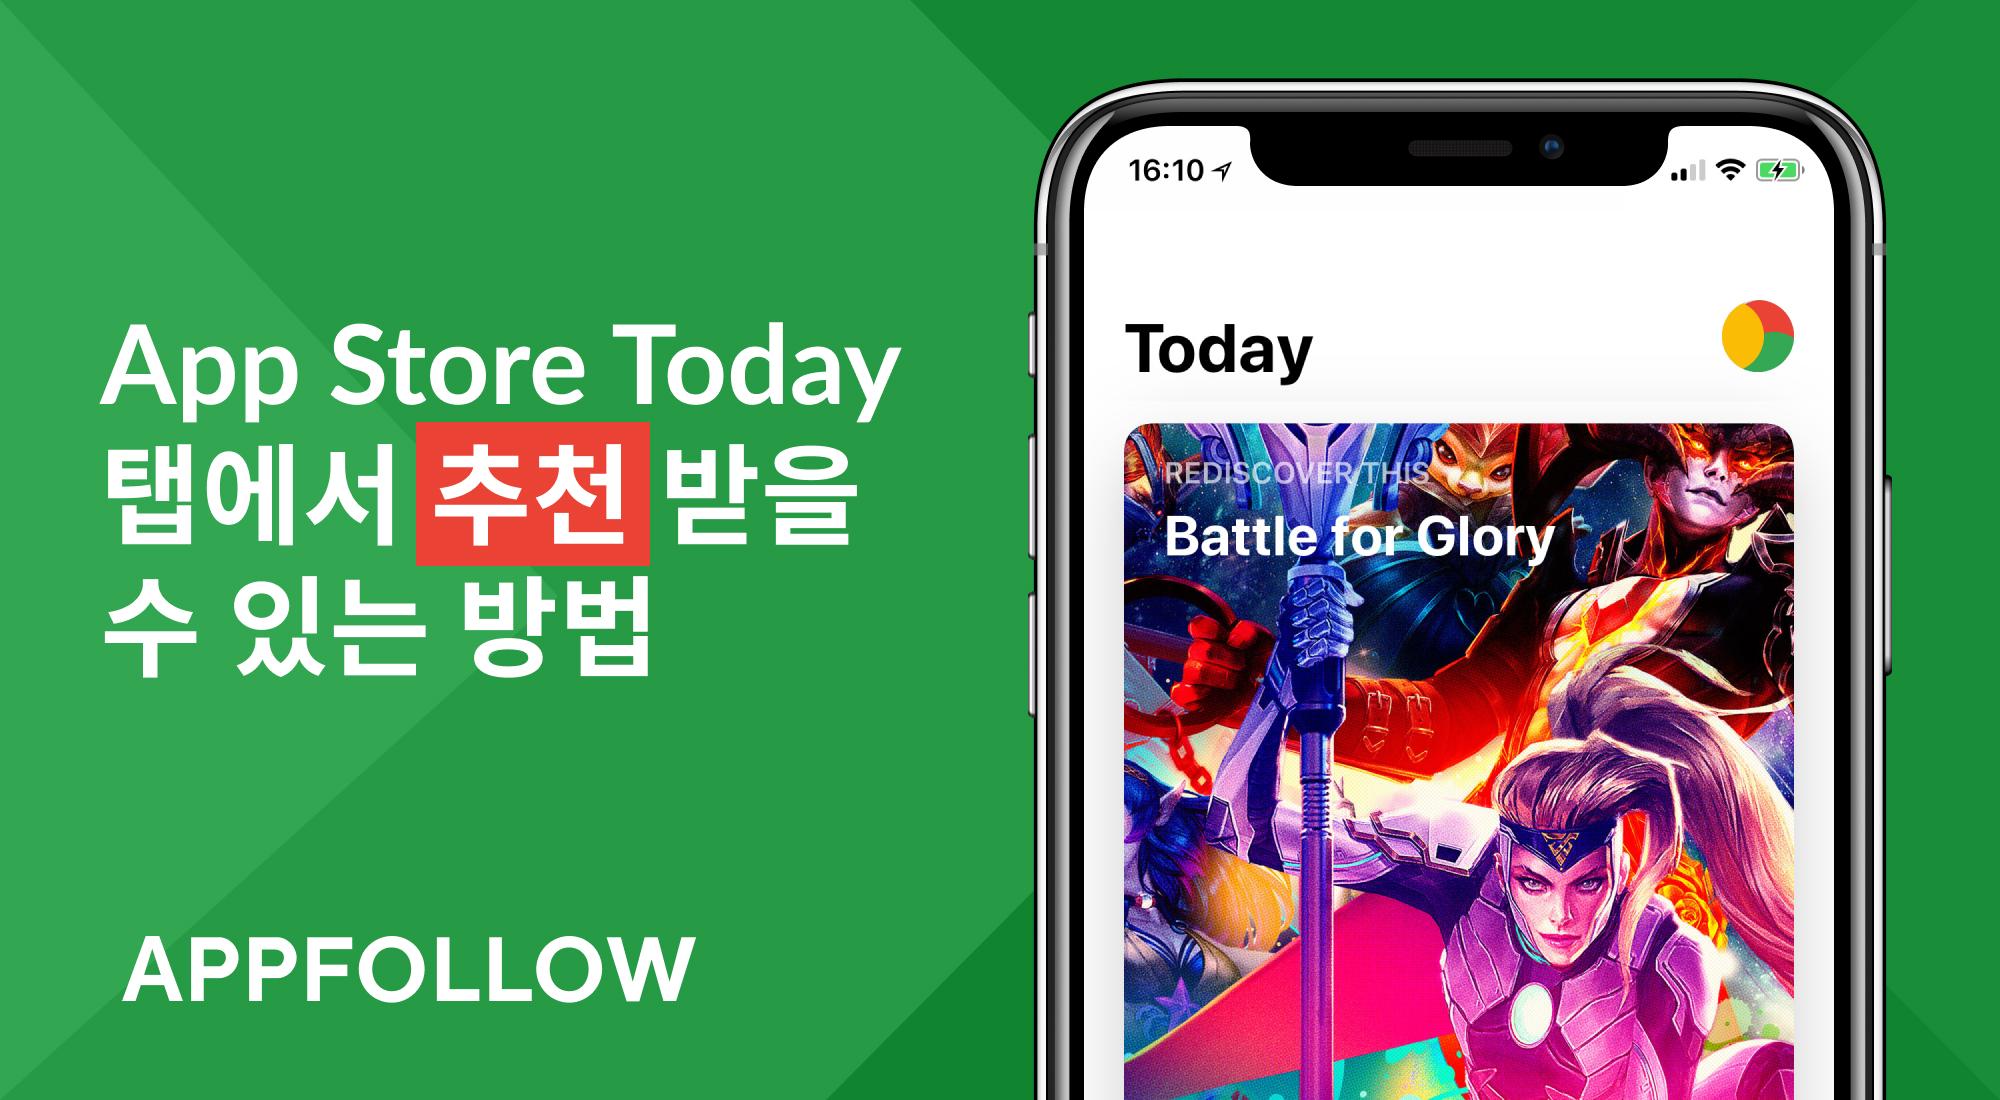 App Store Today 탭에서 추천 받을 수 있는 방법